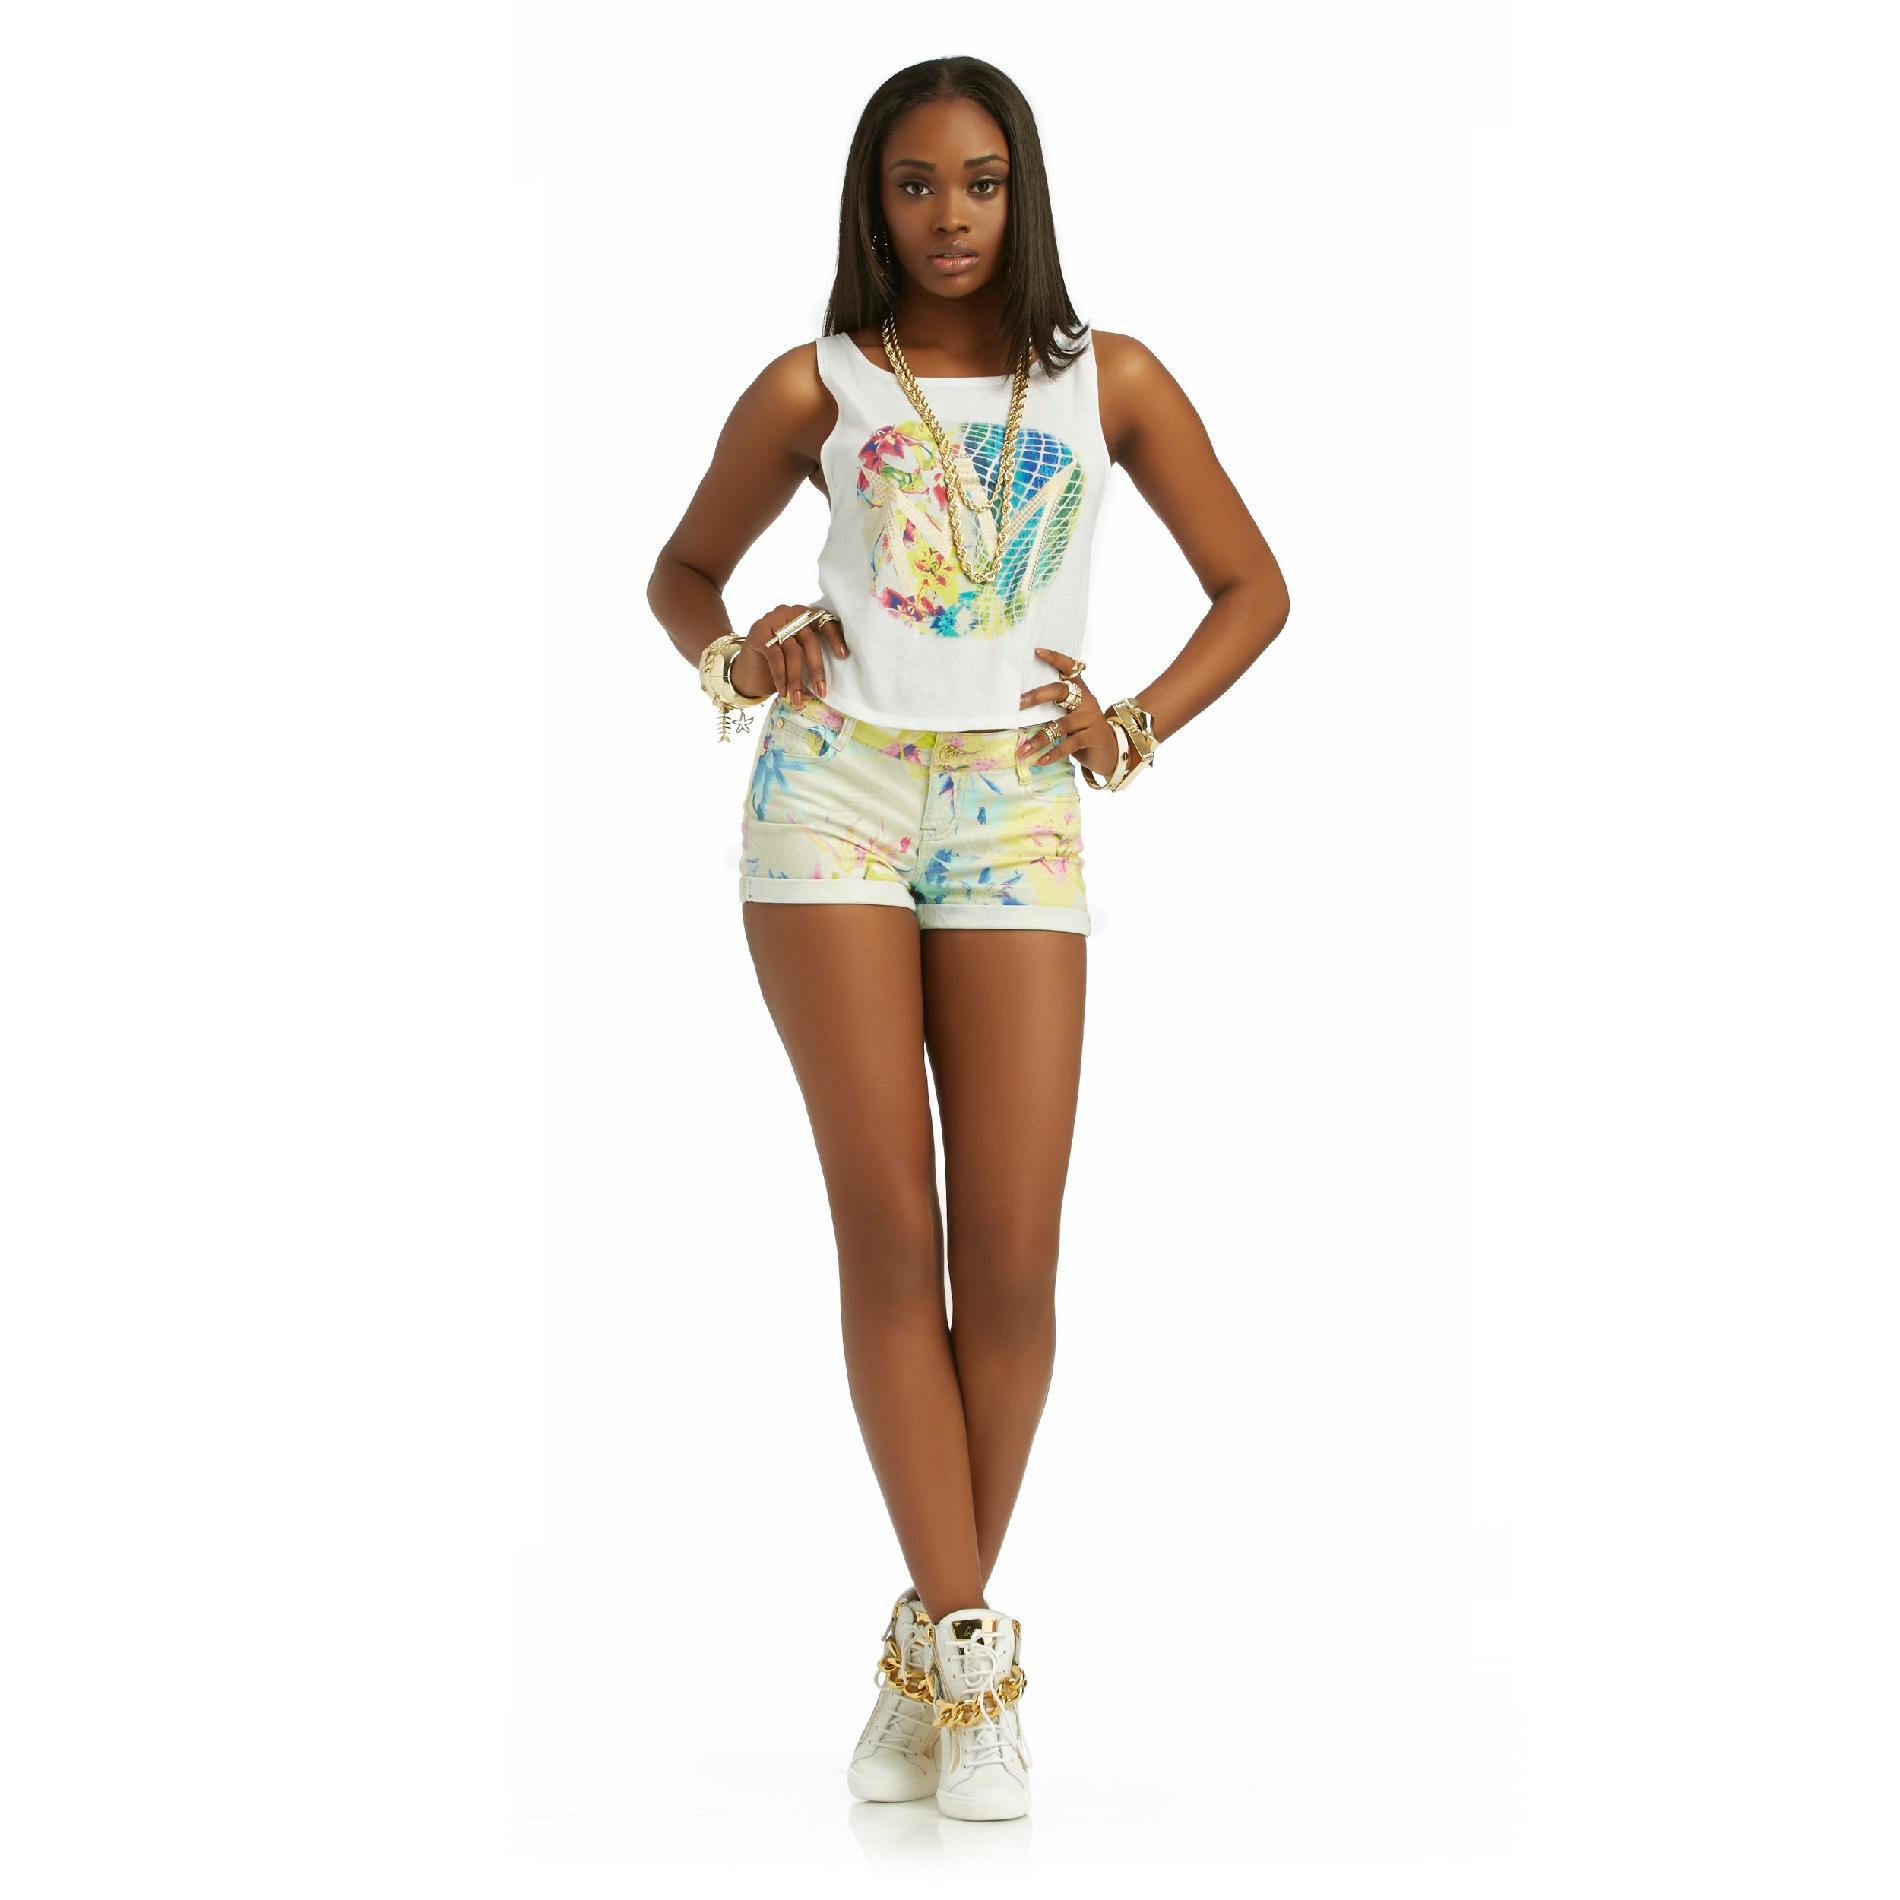 Nicki Minaj Women's Summer Look 17 at Kmart.com